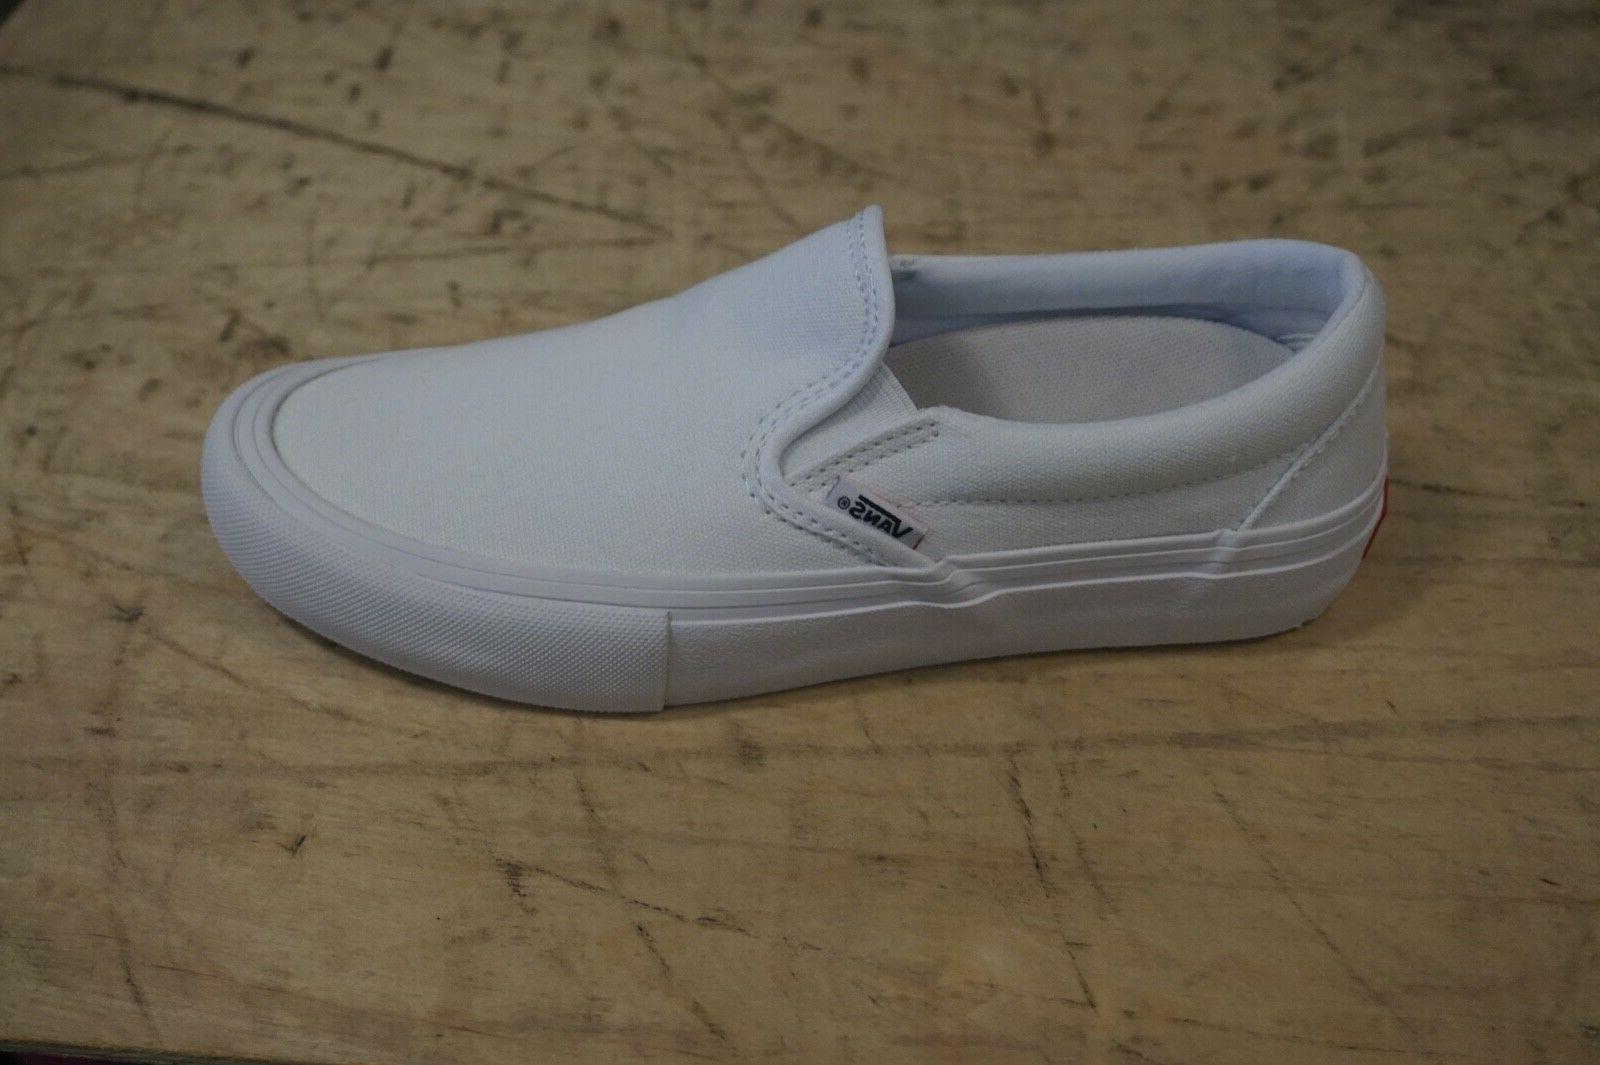 slip on pro new size 9 white